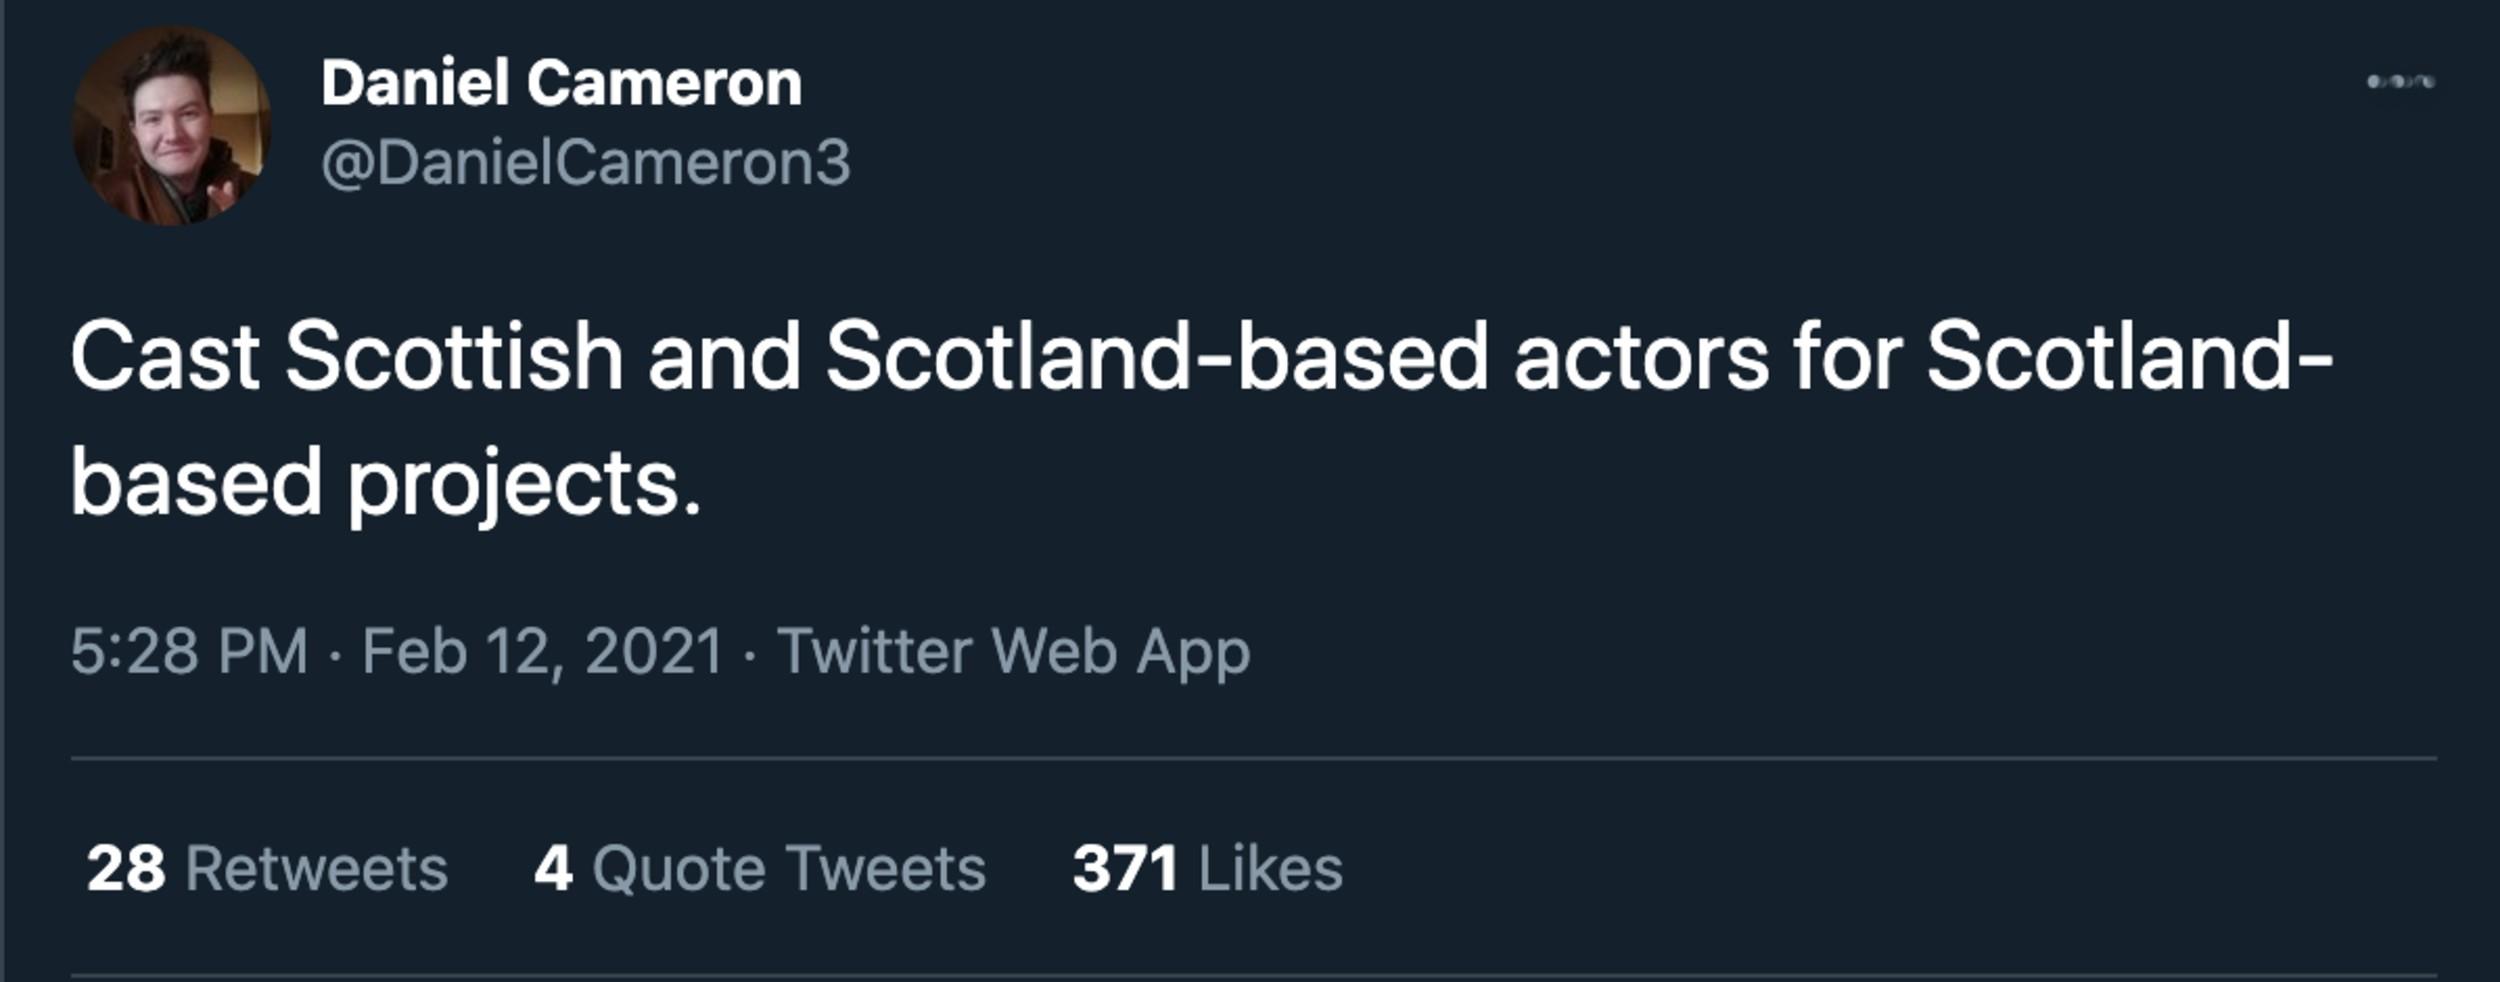 Daniel Cameron tweet - Entertainment News Scotland